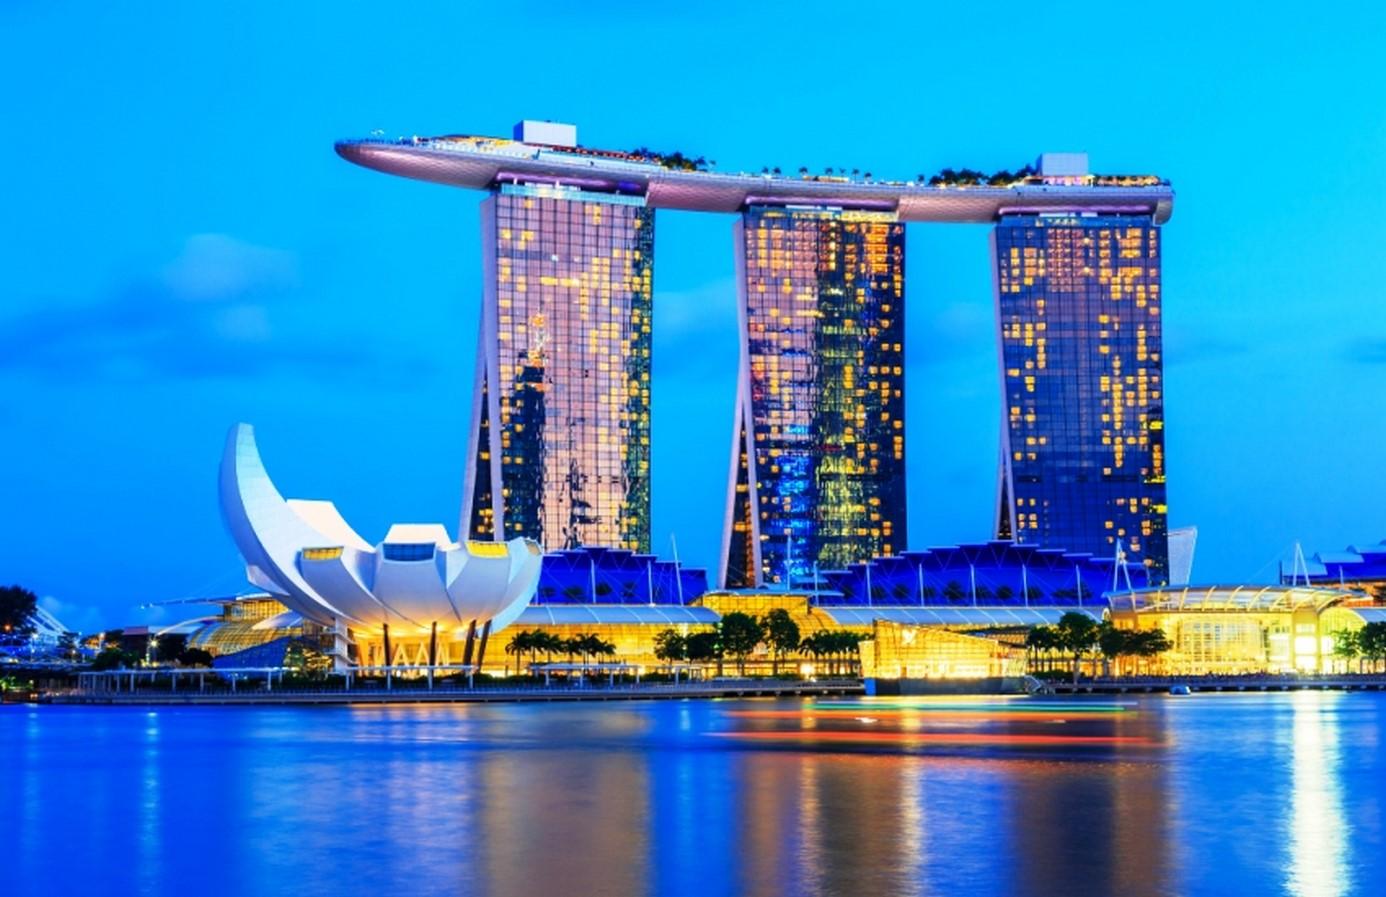 Marina Bay Sands in Singapore. - Sheet2